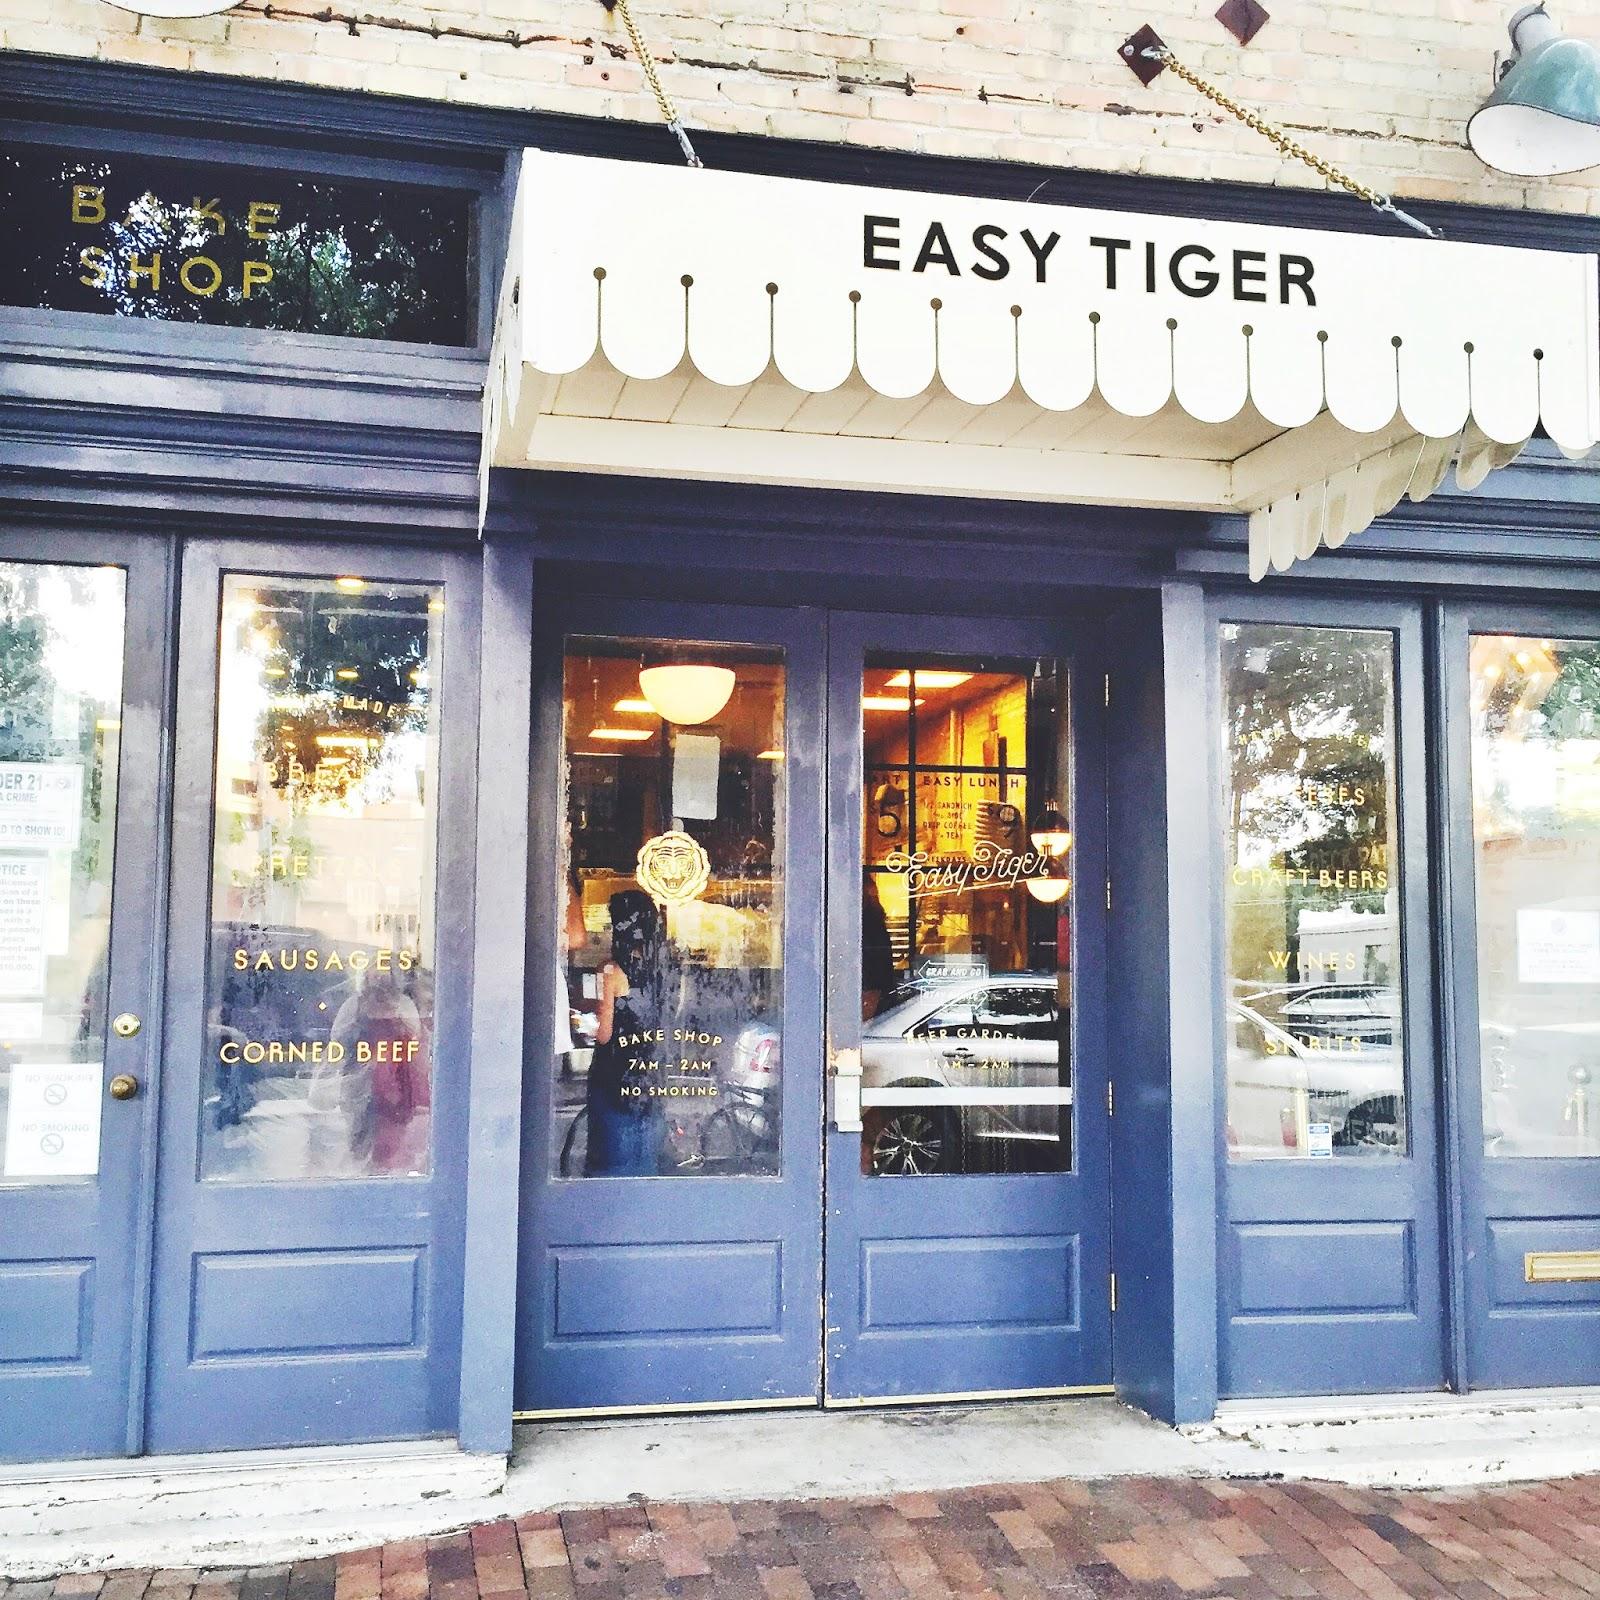 Easy Tiger Austin 6th street